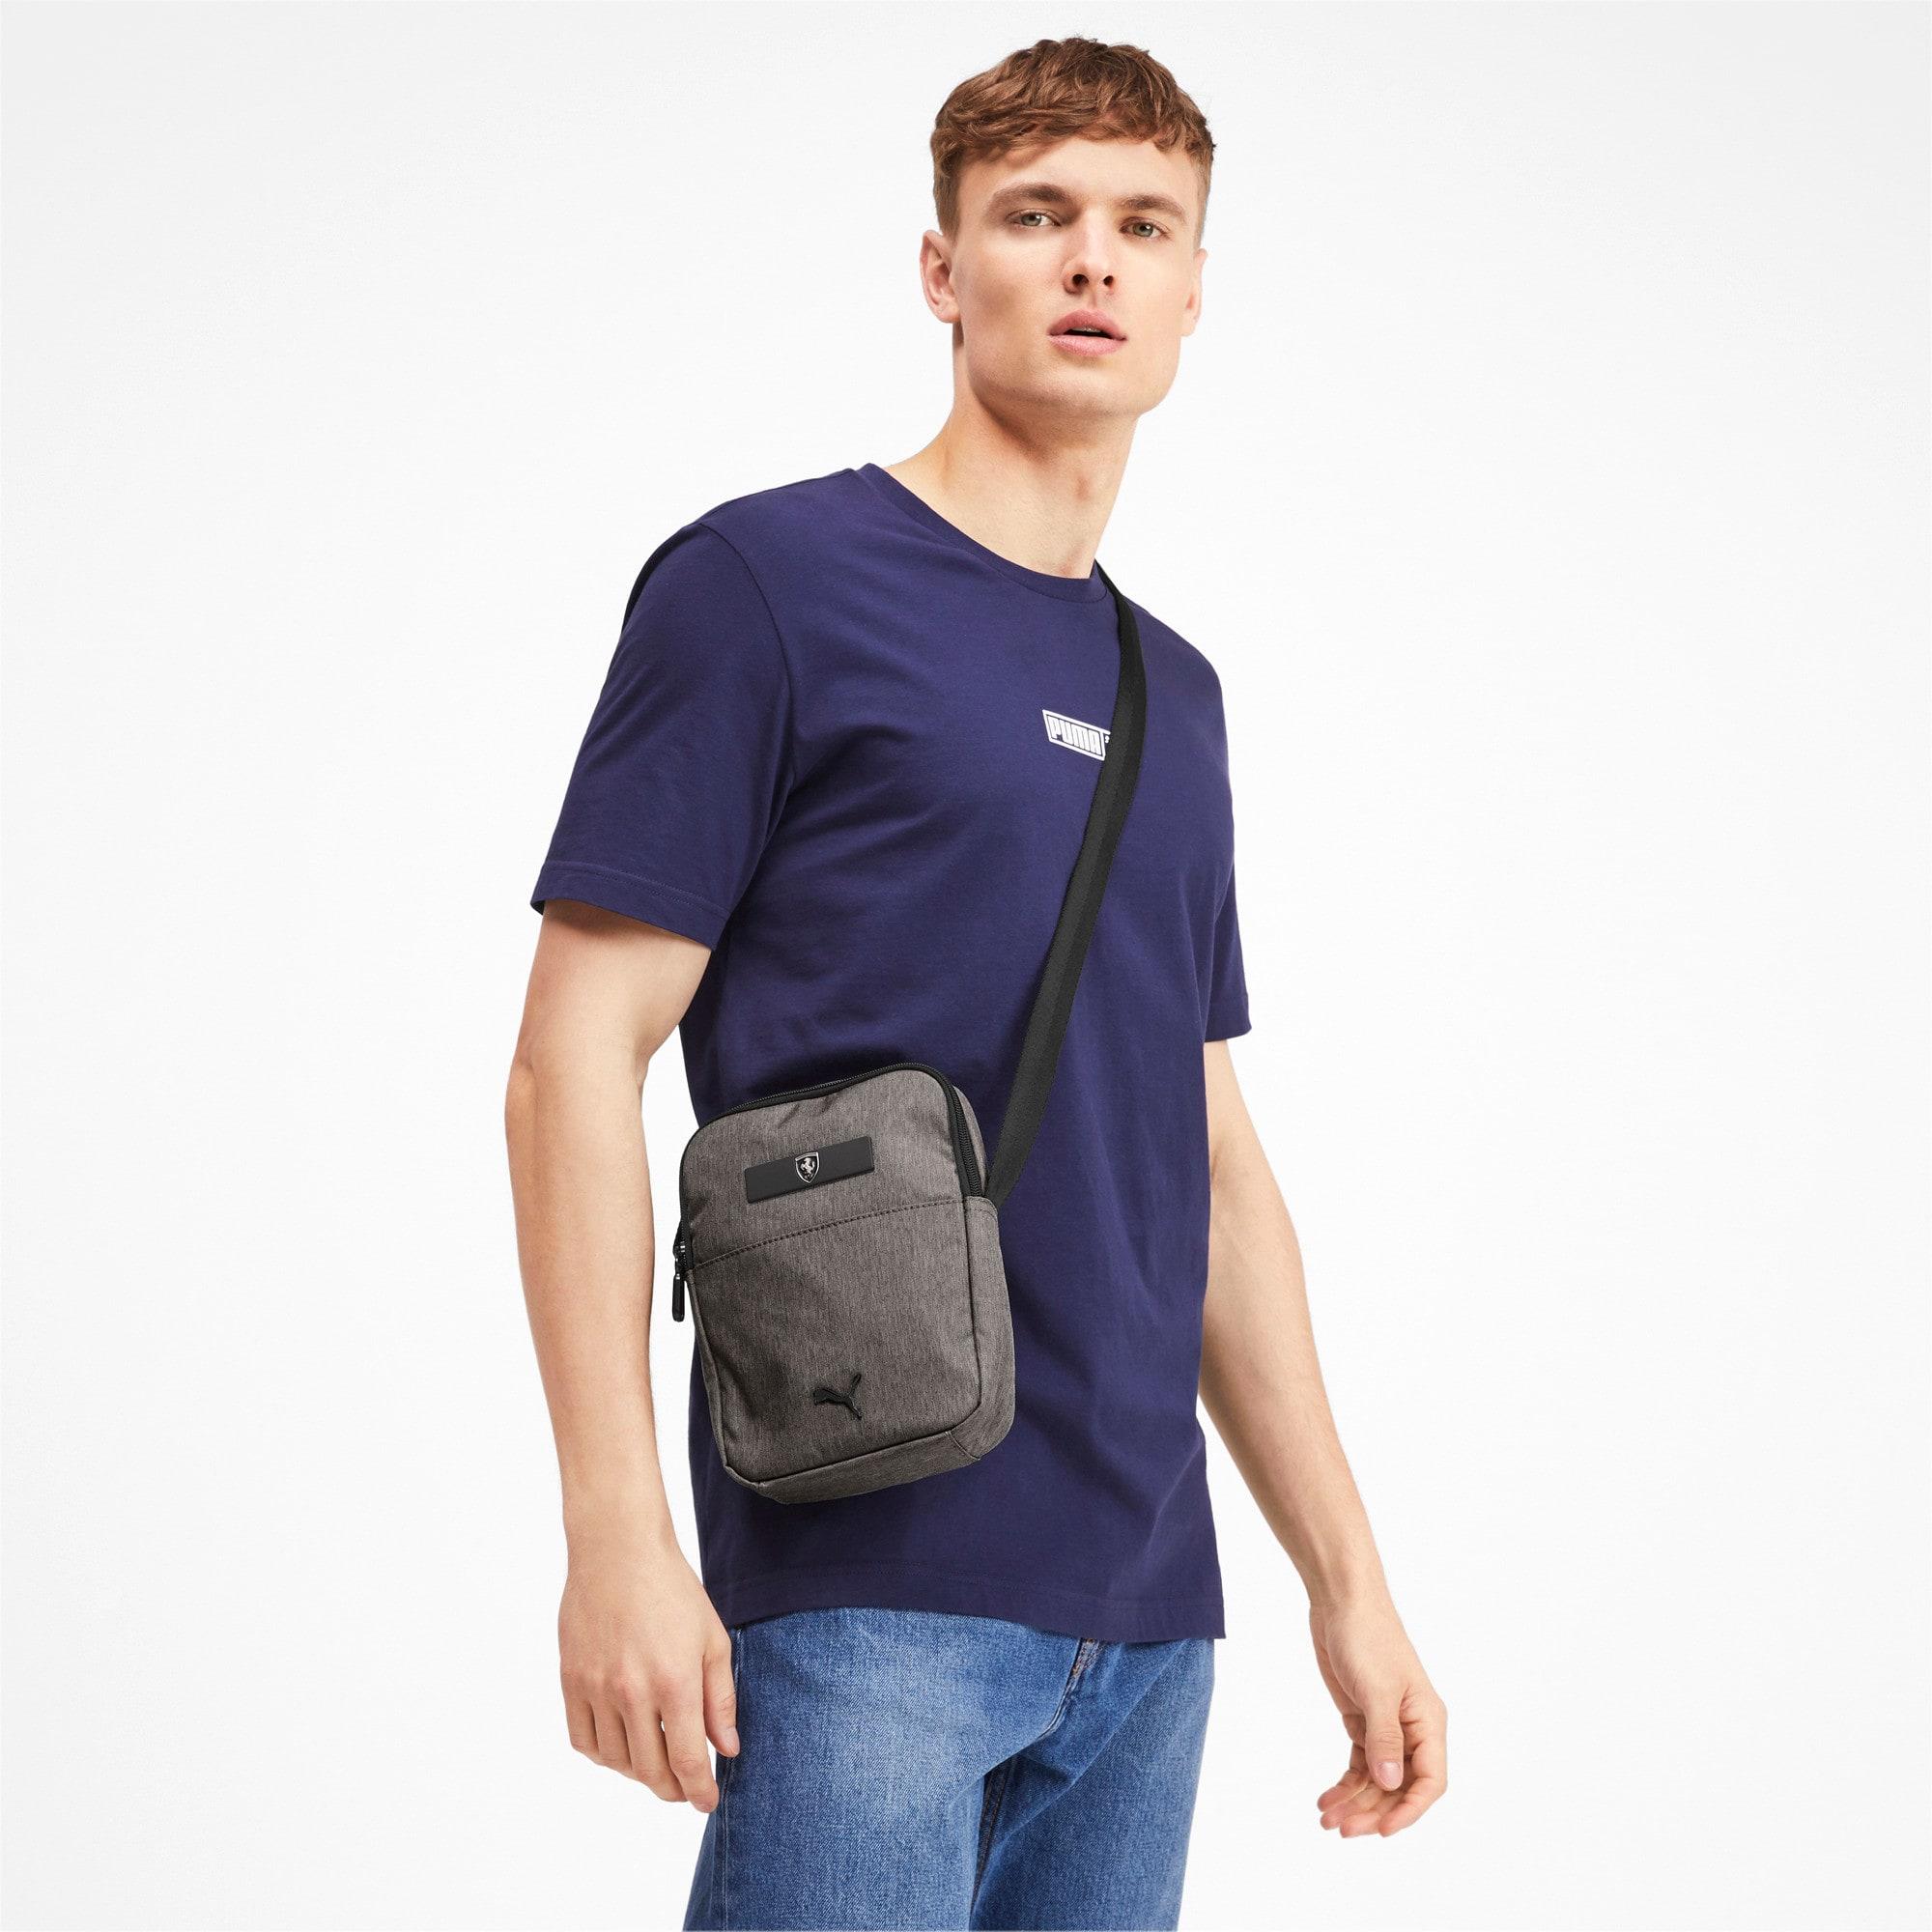 Thumbnail 2 of Ferrari Lifestyle Portable Bag, Charcoal Gray, medium-IND